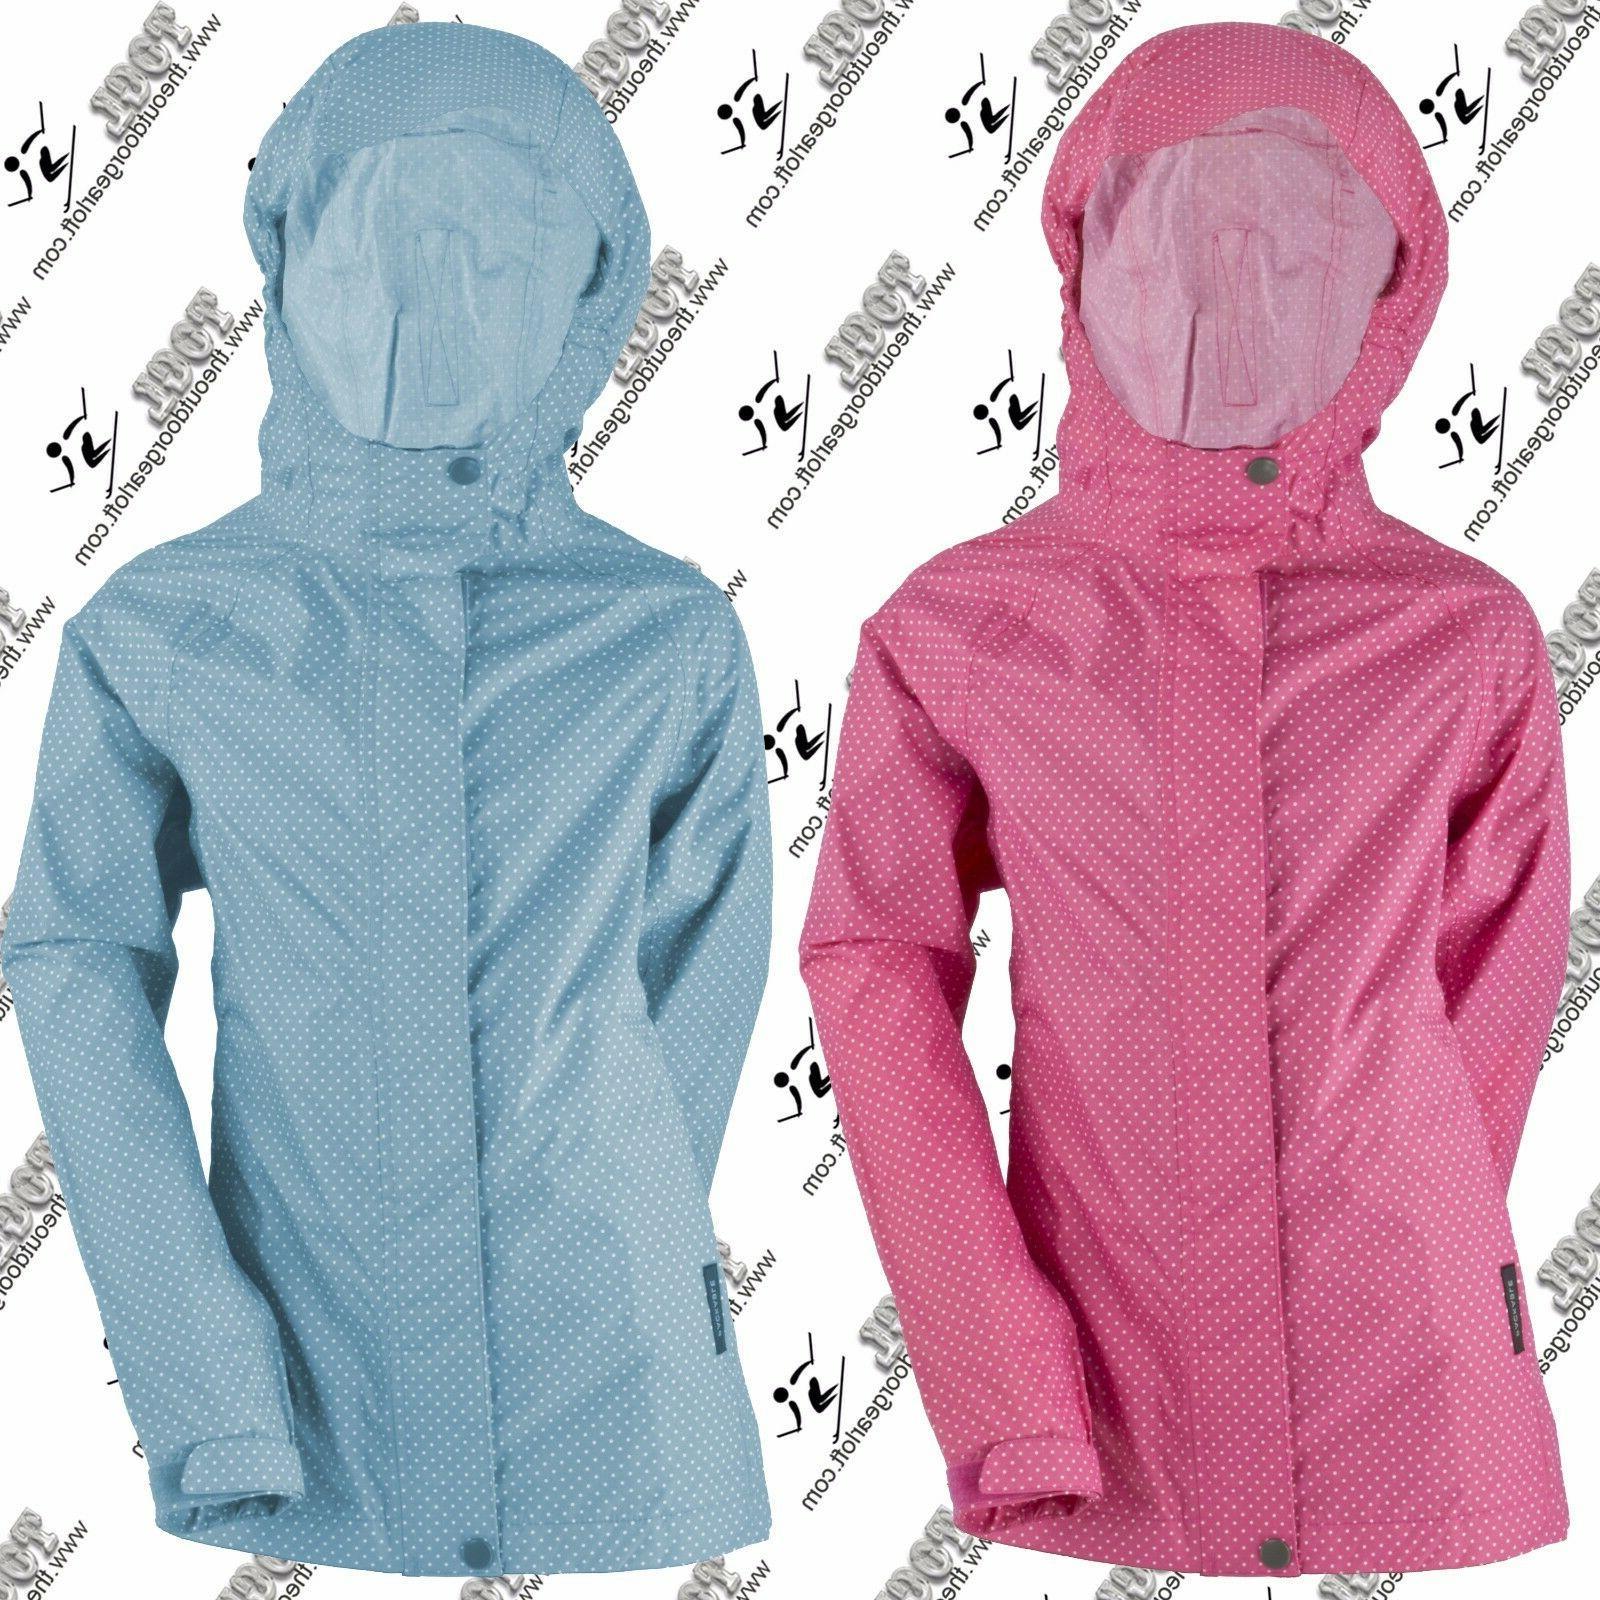 WHITE SIERRA X2226Y NEW YOUTH GIRLS POLKA DOT TRABAGON RAIN